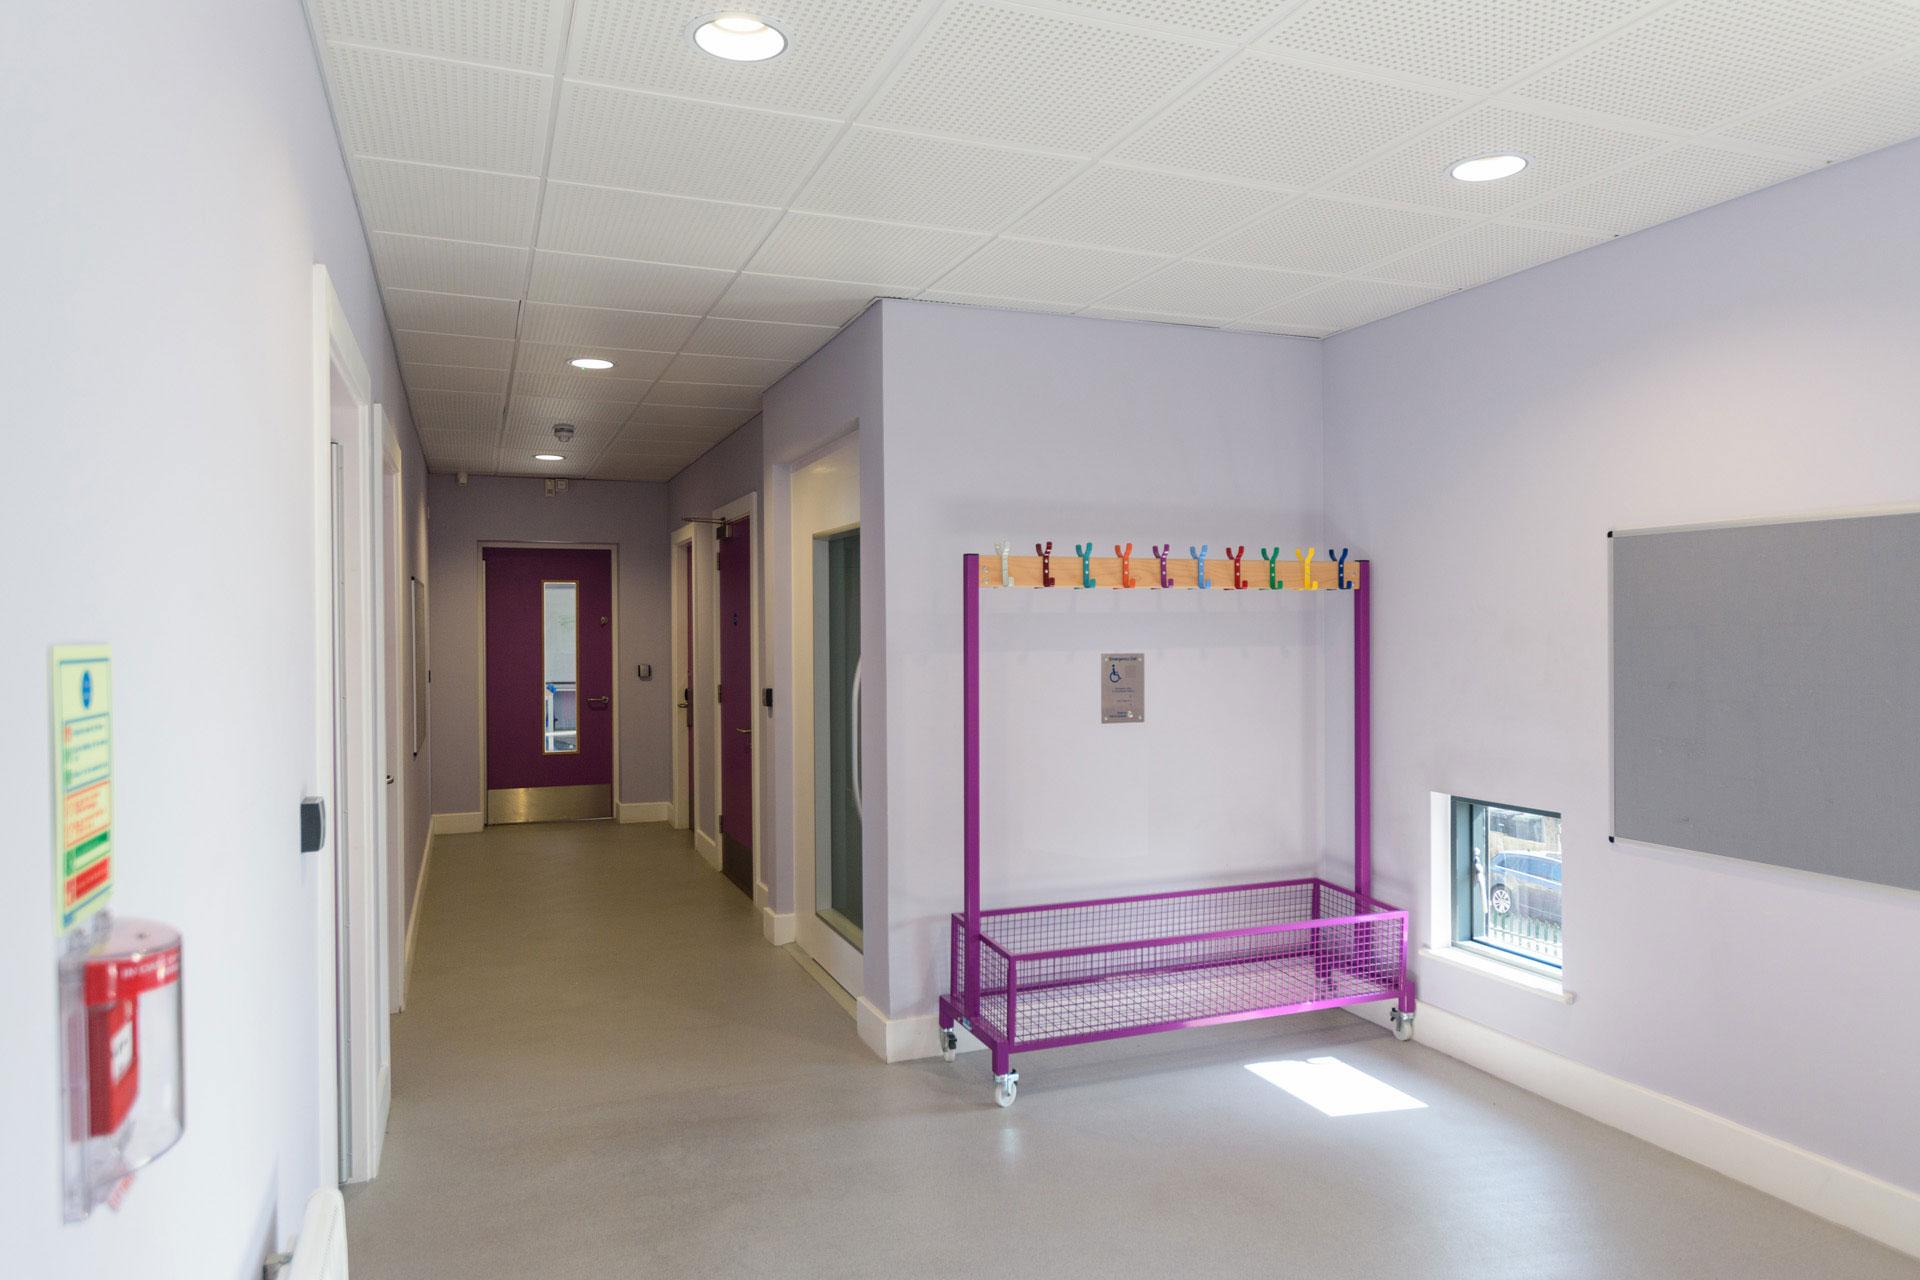 Drumbet School and ASD 6th Form teaching - Modular SEN building internal DDA lift and corridor